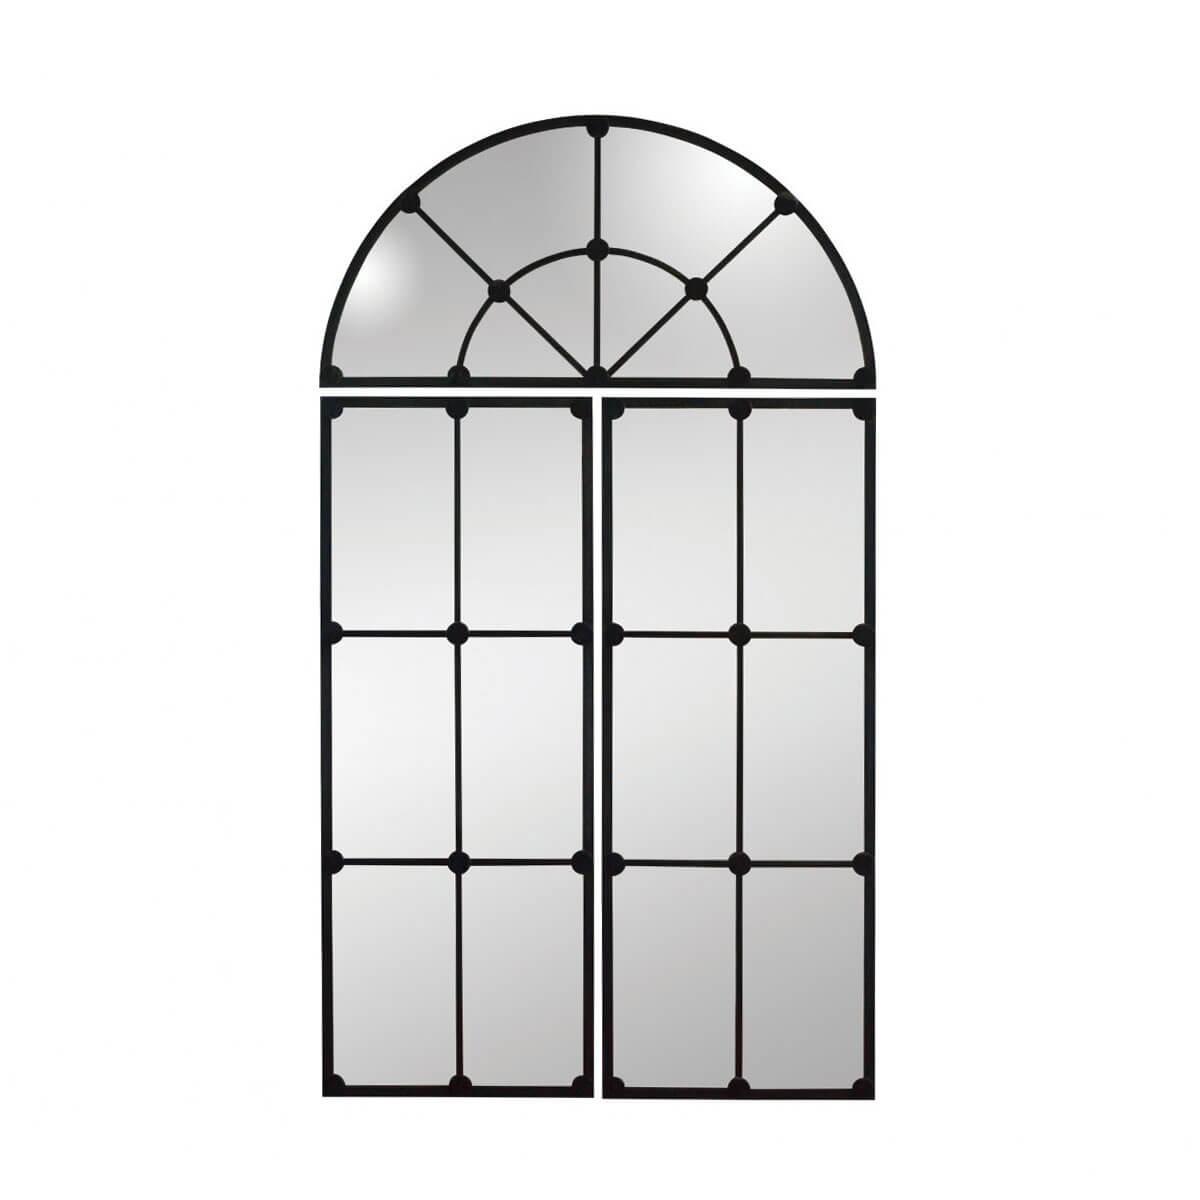 Conservatory-Window-Mirror-Tall-CozyHome-Dubai